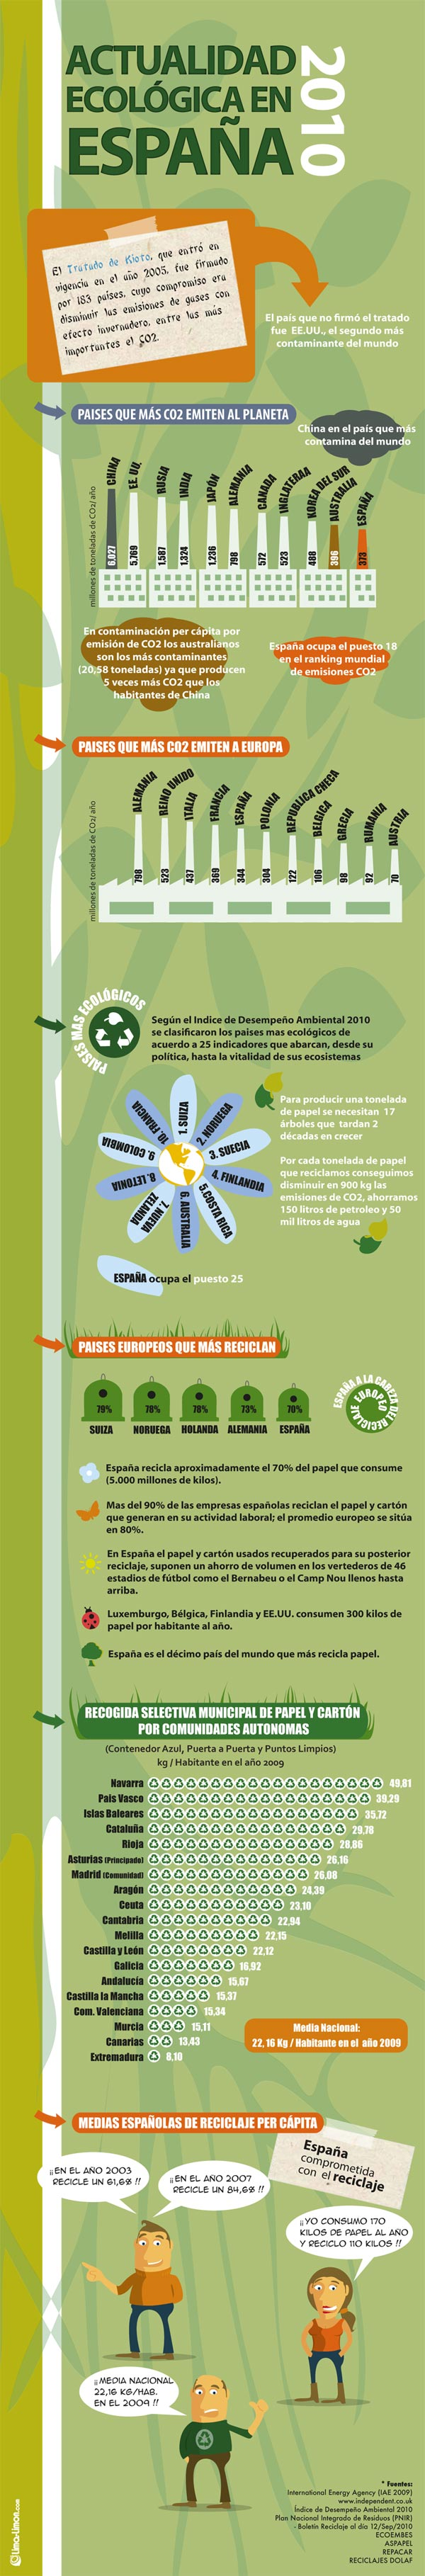 Infografia actualidad ecológica